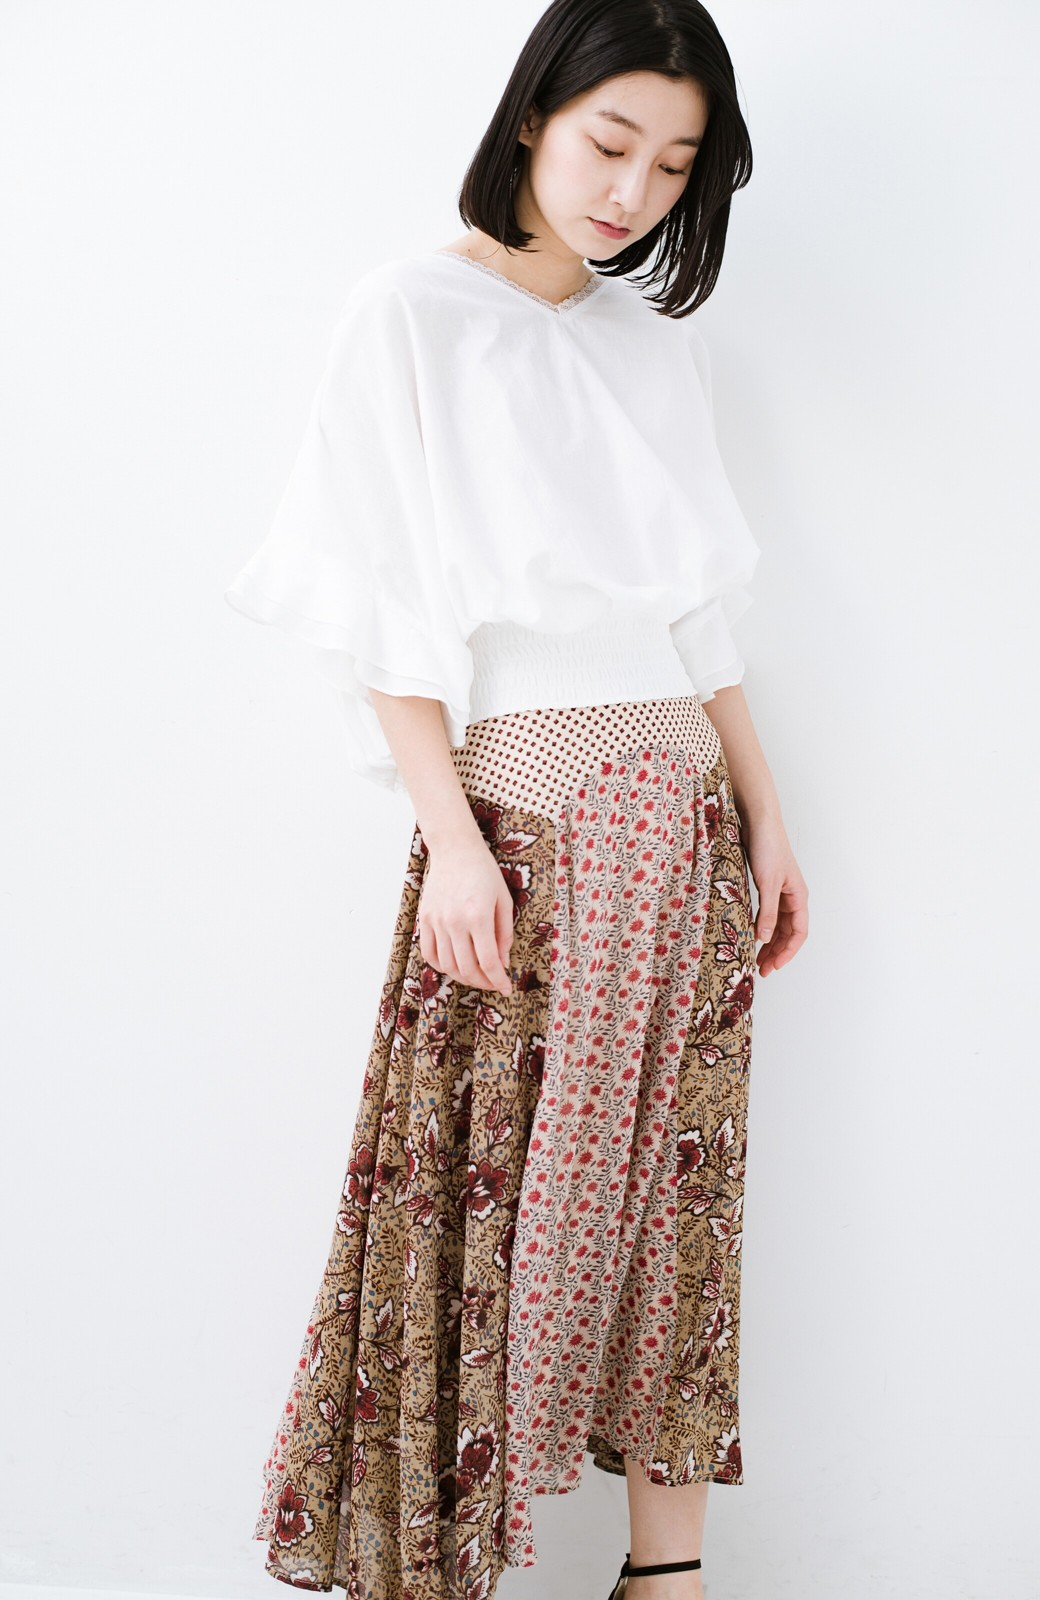 haco! 【洗濯機洗いOK】シンプルなトップスに合わせるだけでかわいくなれる MIX柄スカート <ベージュ系その他>の商品写真15